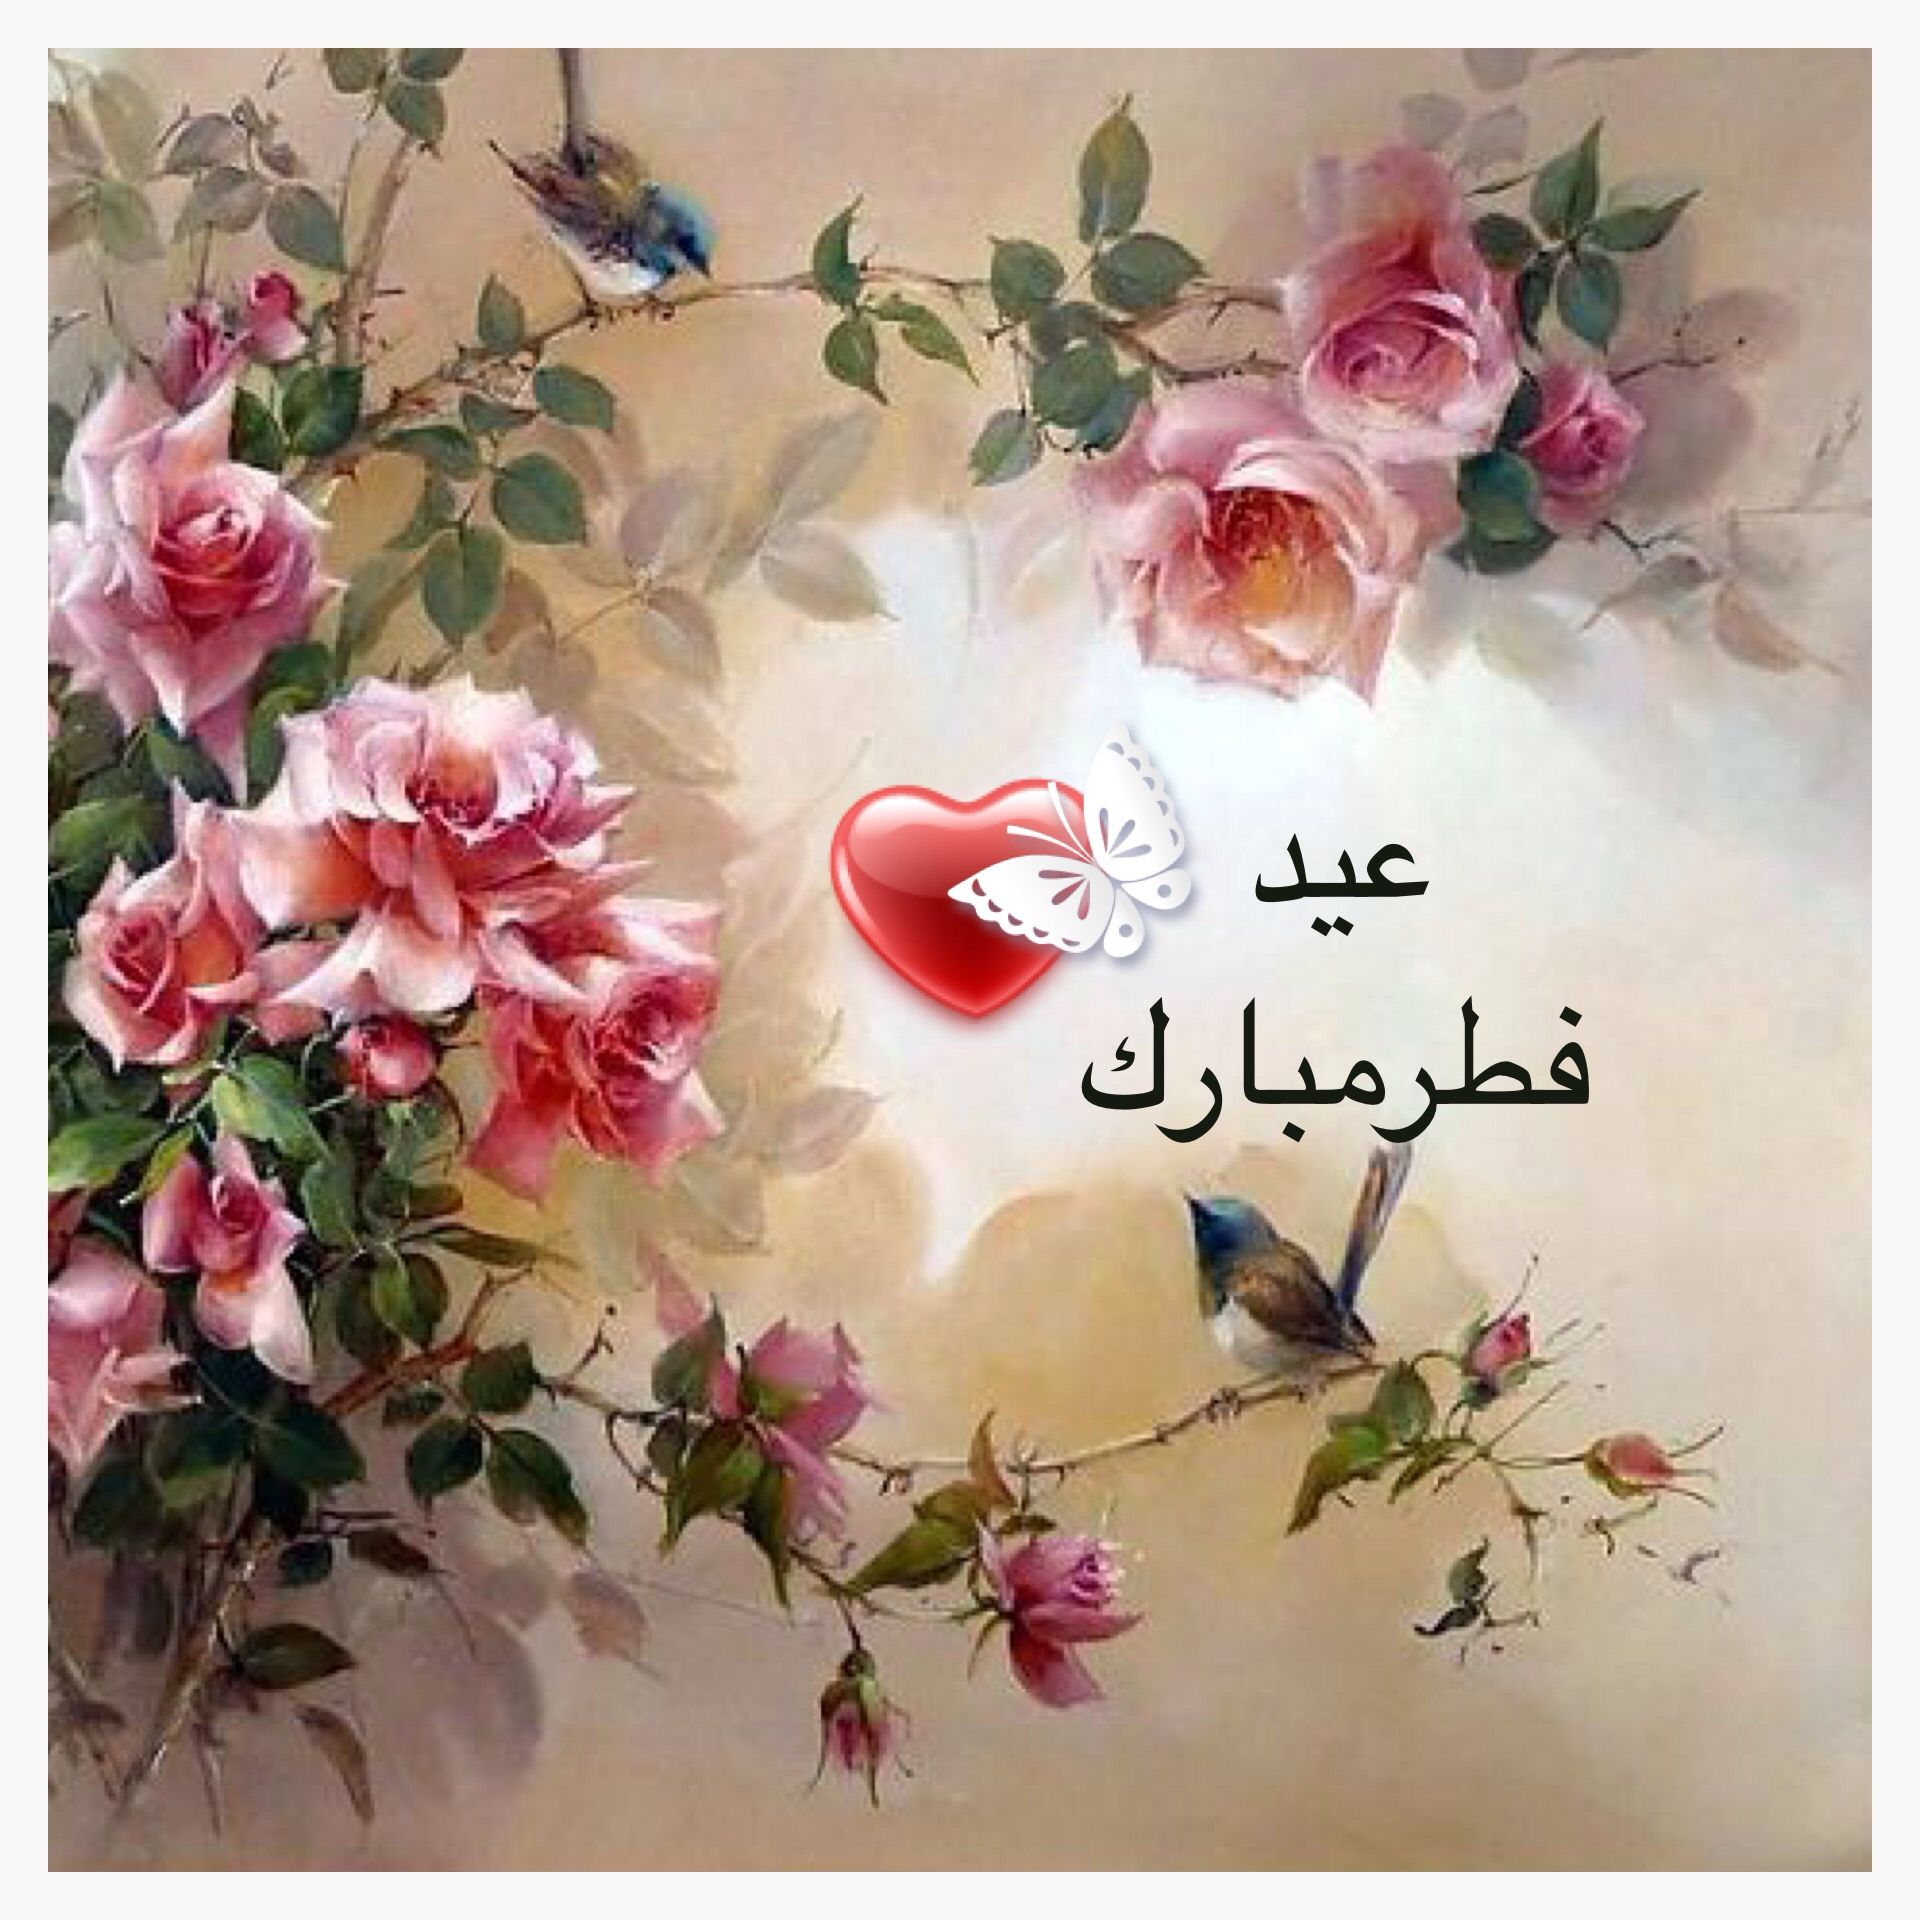 عيد فطر مبارك Eid Stickers Wreath Tattoo Floral Wreath